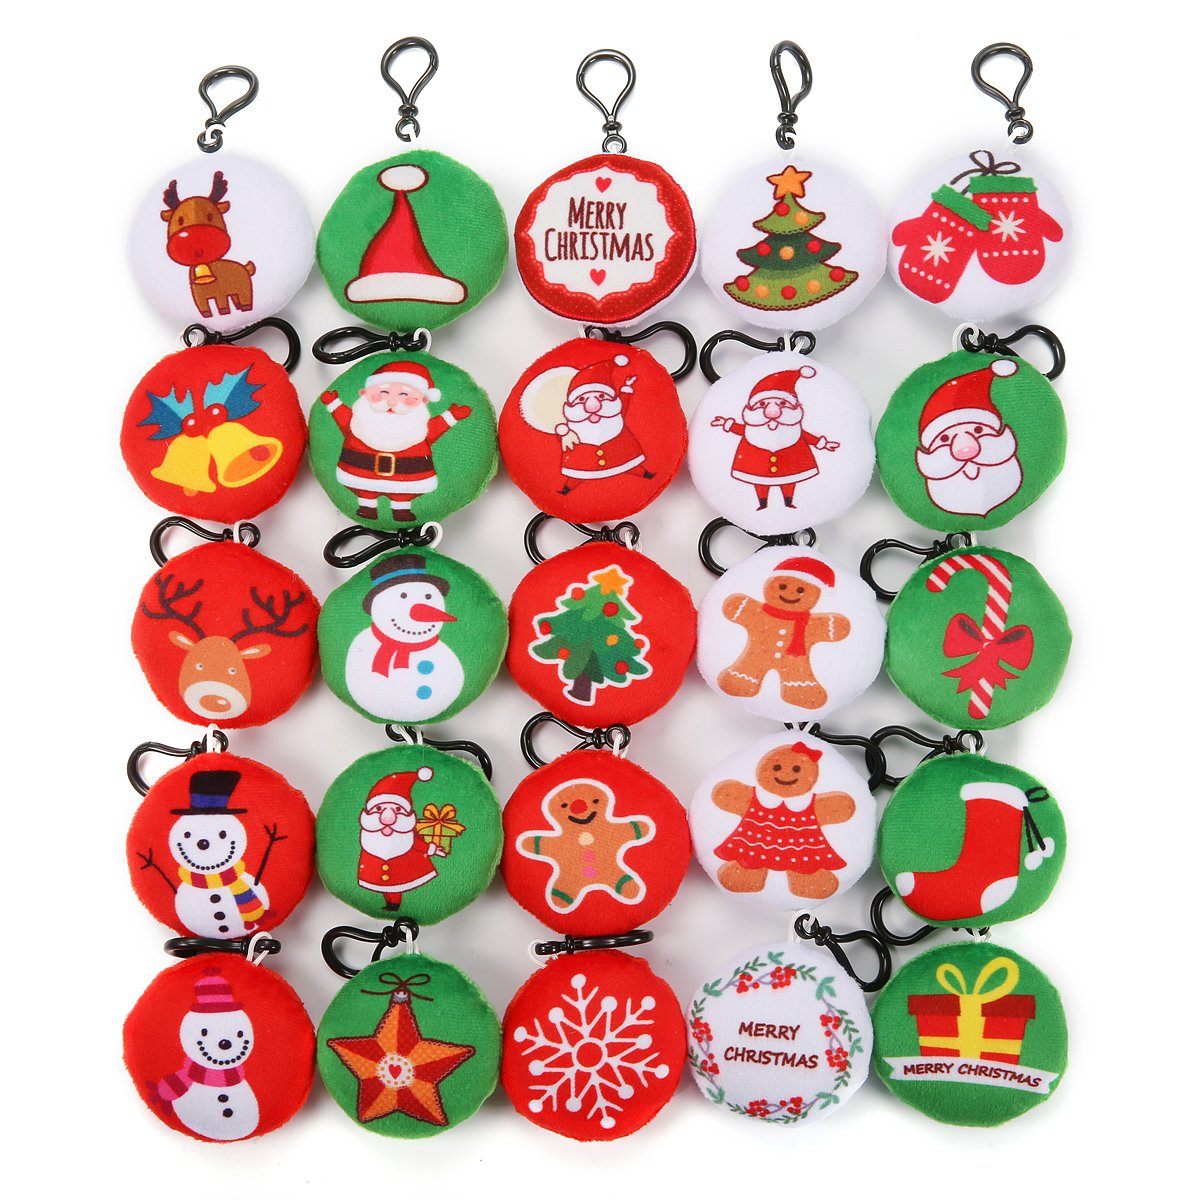 KINGSO Mini Emoji Plush Pillow Emoticon Keychain Decoration Kids Party Supplies Favors (Christmas emoji)